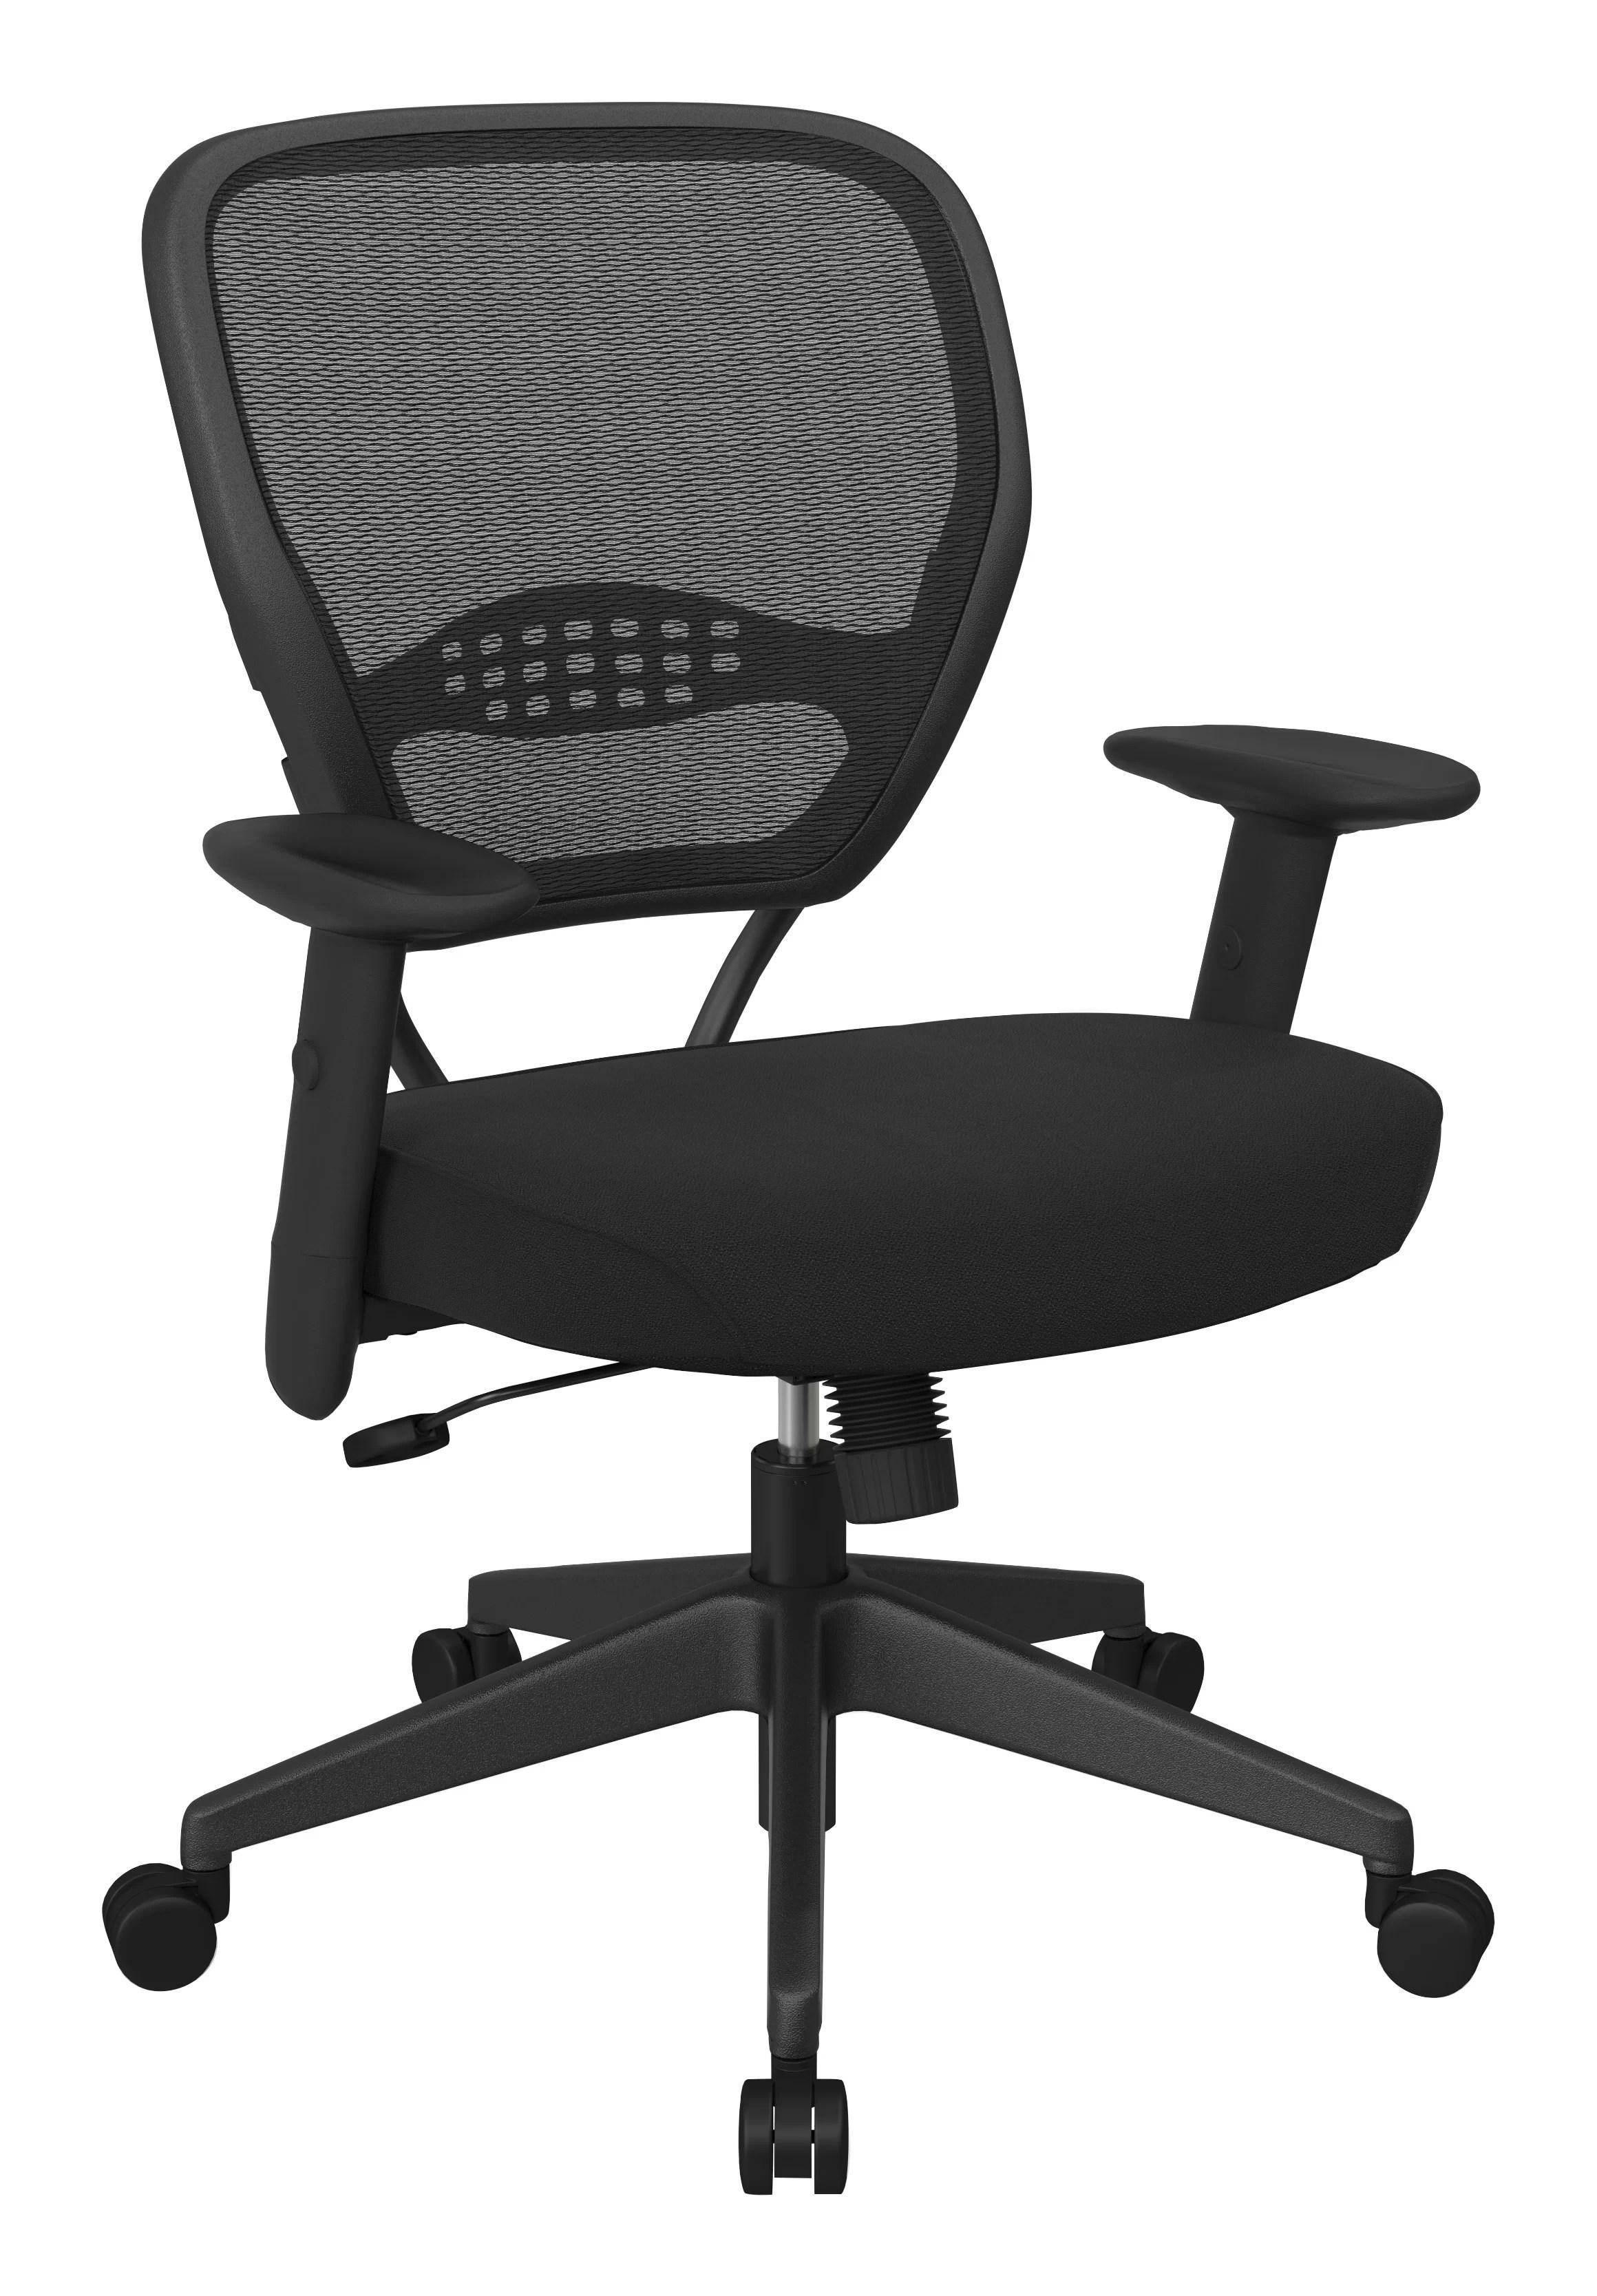 office star chairs vanity chair stool space air grid matrex ergonomic mesh reviews wayfair